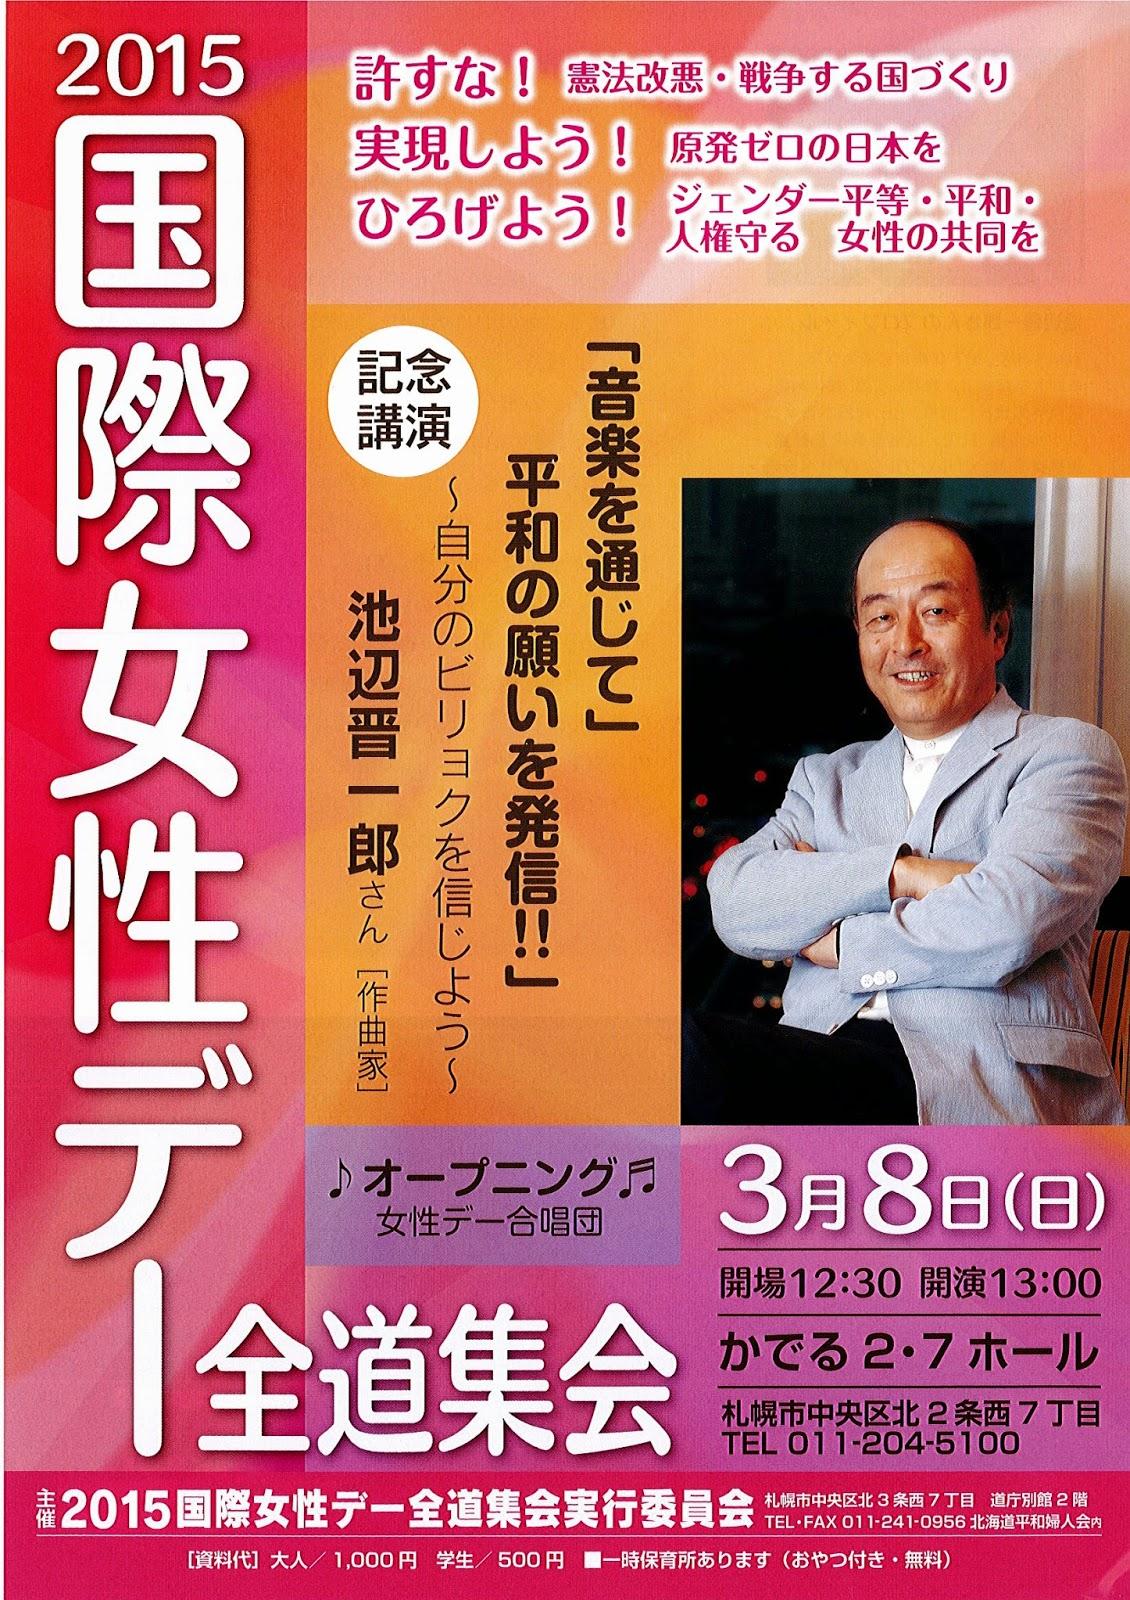 http://shinfujin-hokkaido.com/w/wp-content/uploads/2015/02/DOC150210-20150210144805.pdf